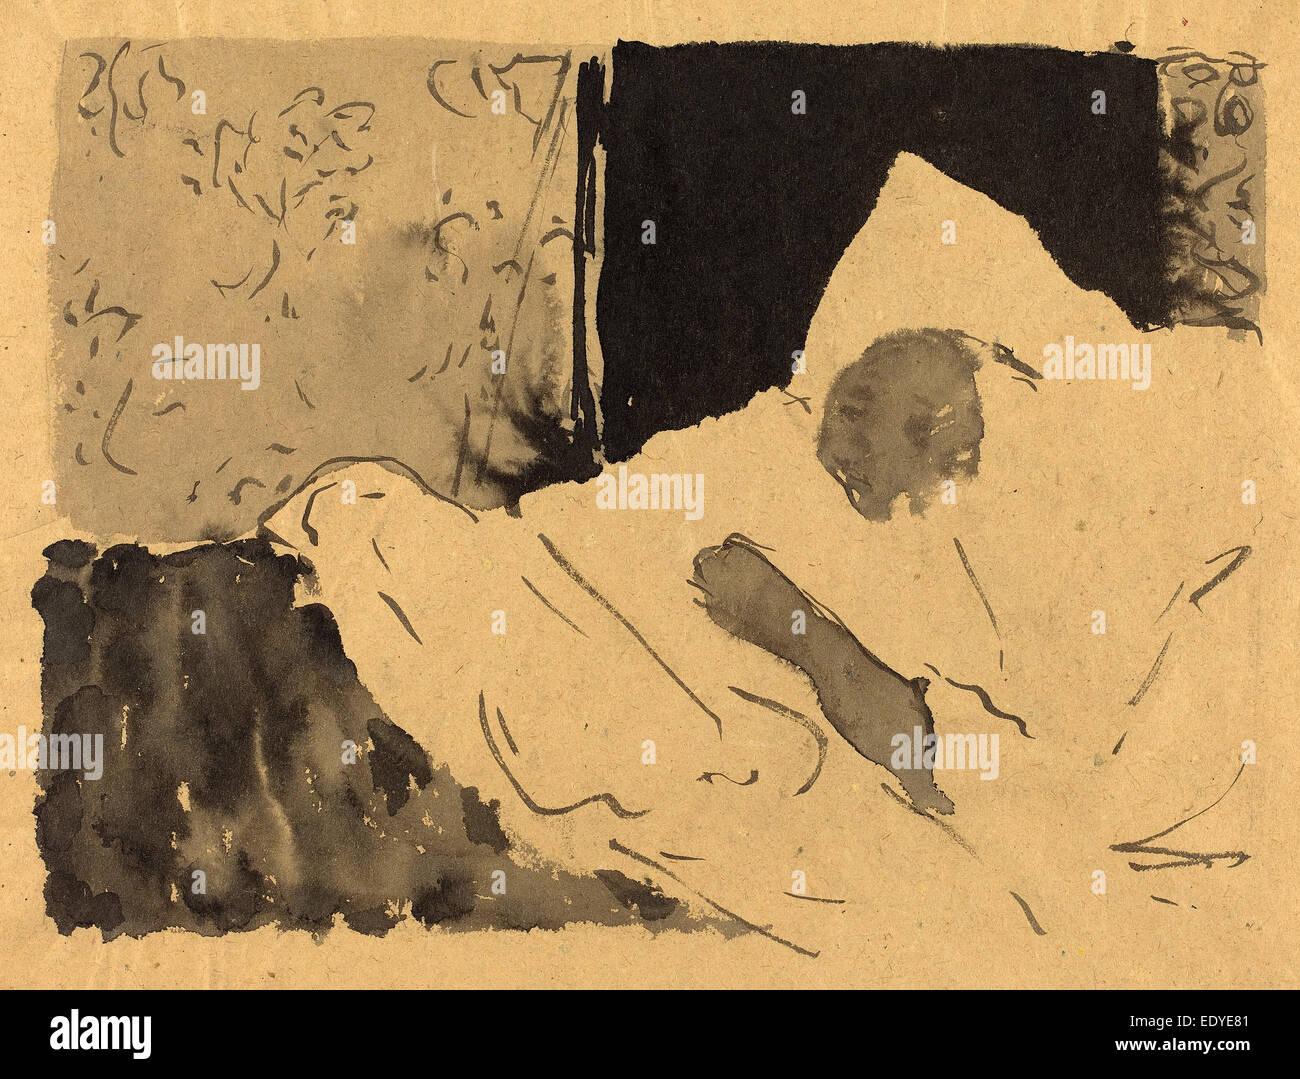 Edouard Vuillard (French, 1868 - 1940), Madame V. Sleeping, c. 1892, brush and black ink - Stock Image